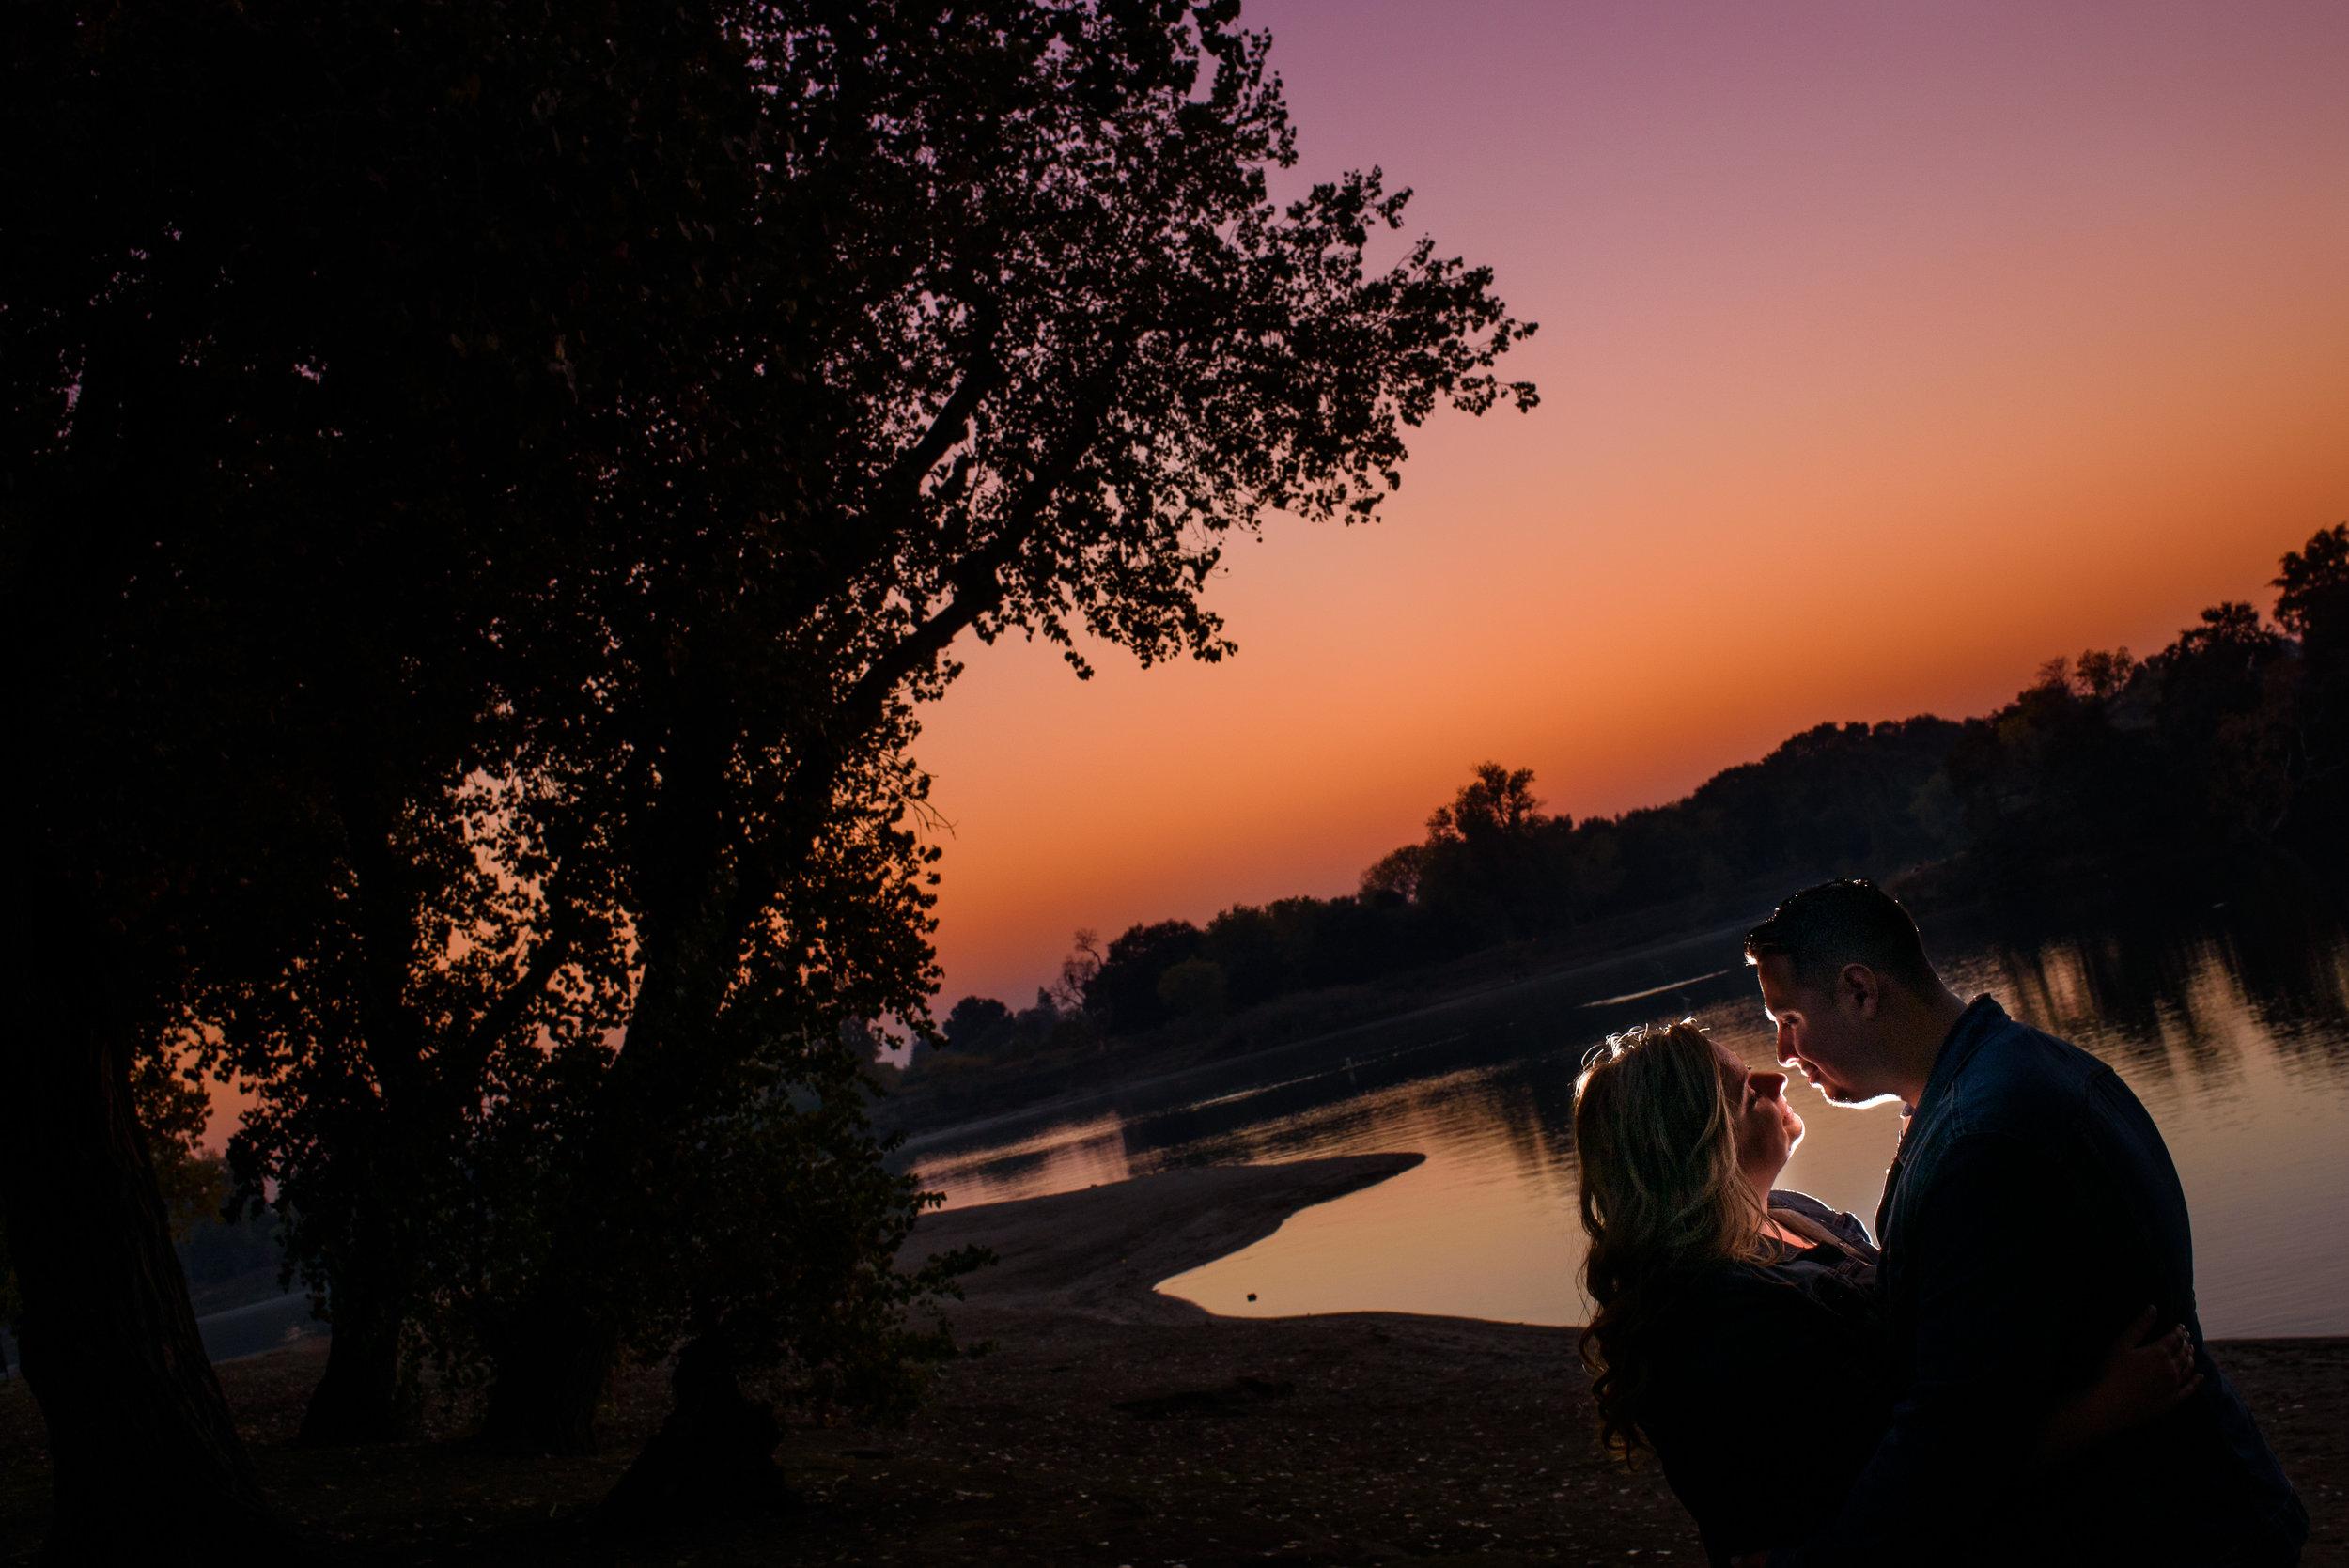 lynzie-javier-013-sacramento-california-engagement-wedding-photographer-katherine-nicole-photography.JPG